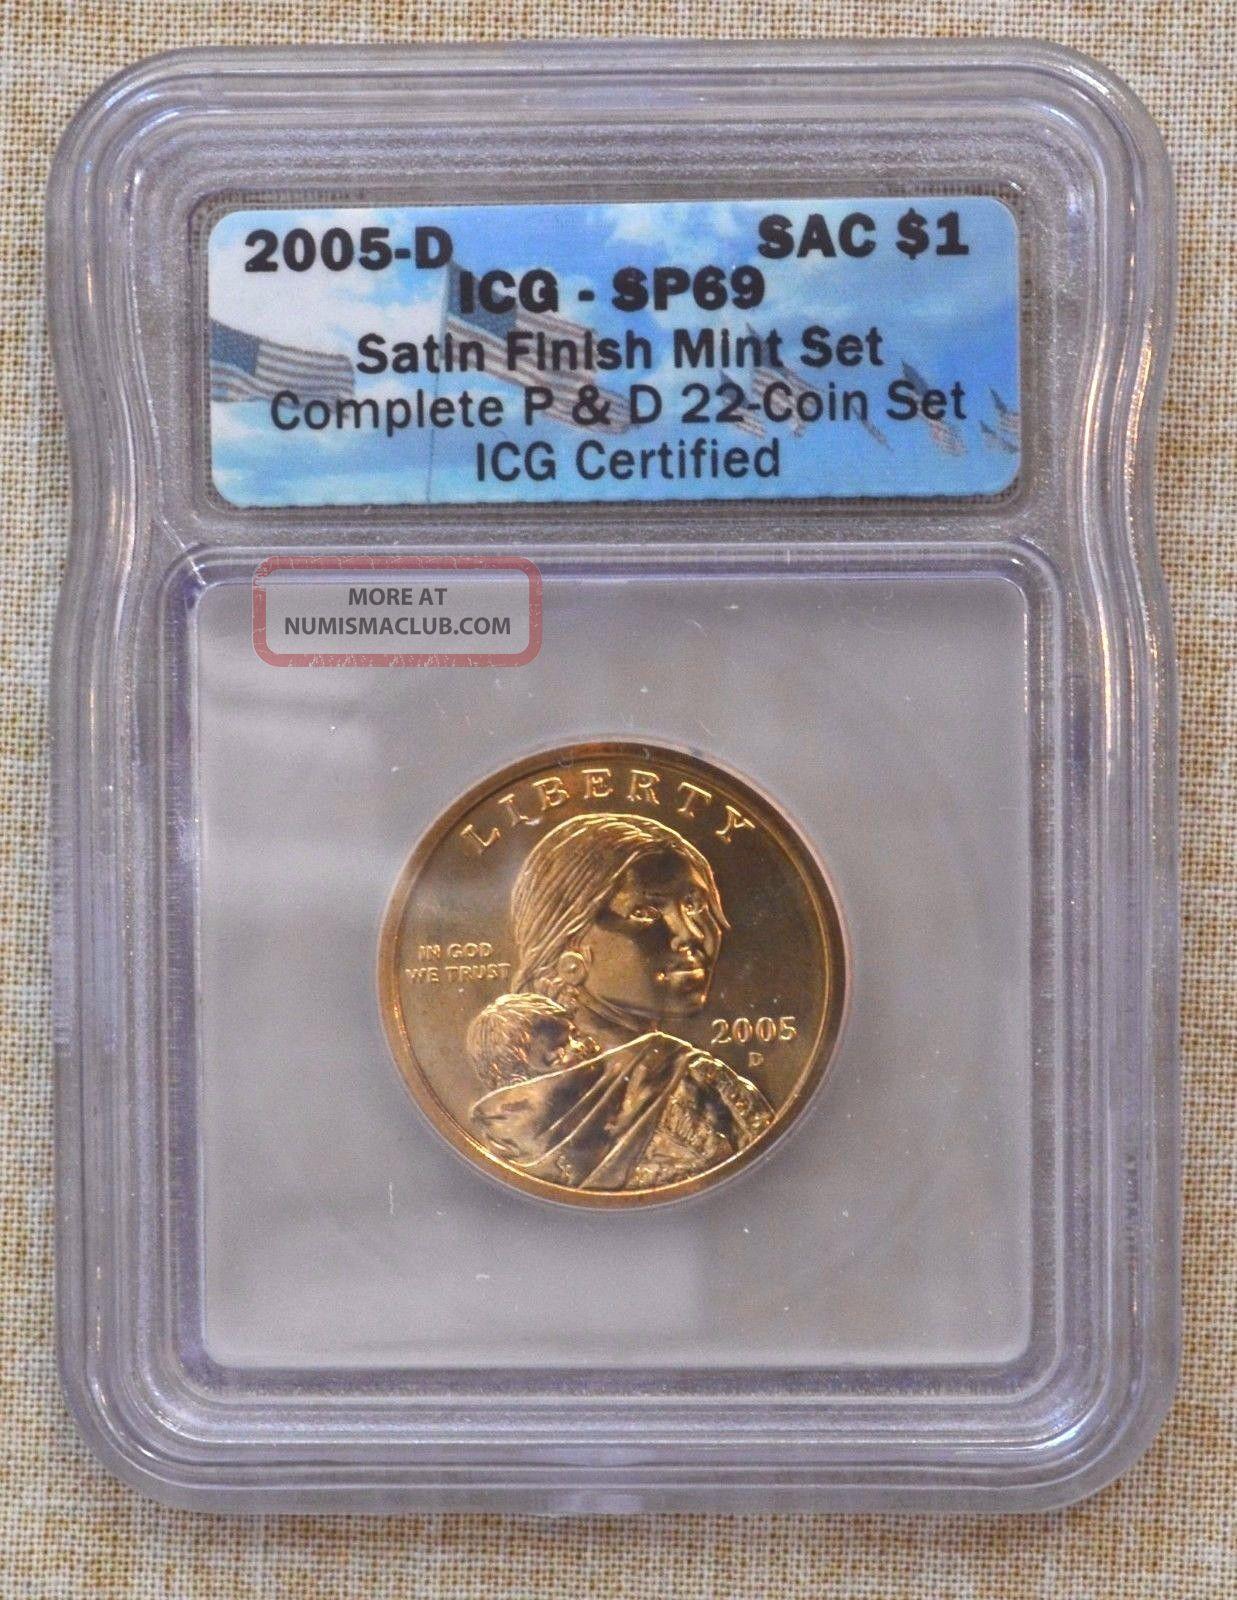 2005 - D Sacagawea Dollar - Icg Slabbed - Satin Finish - Sp69 Native American (2000-Now) photo